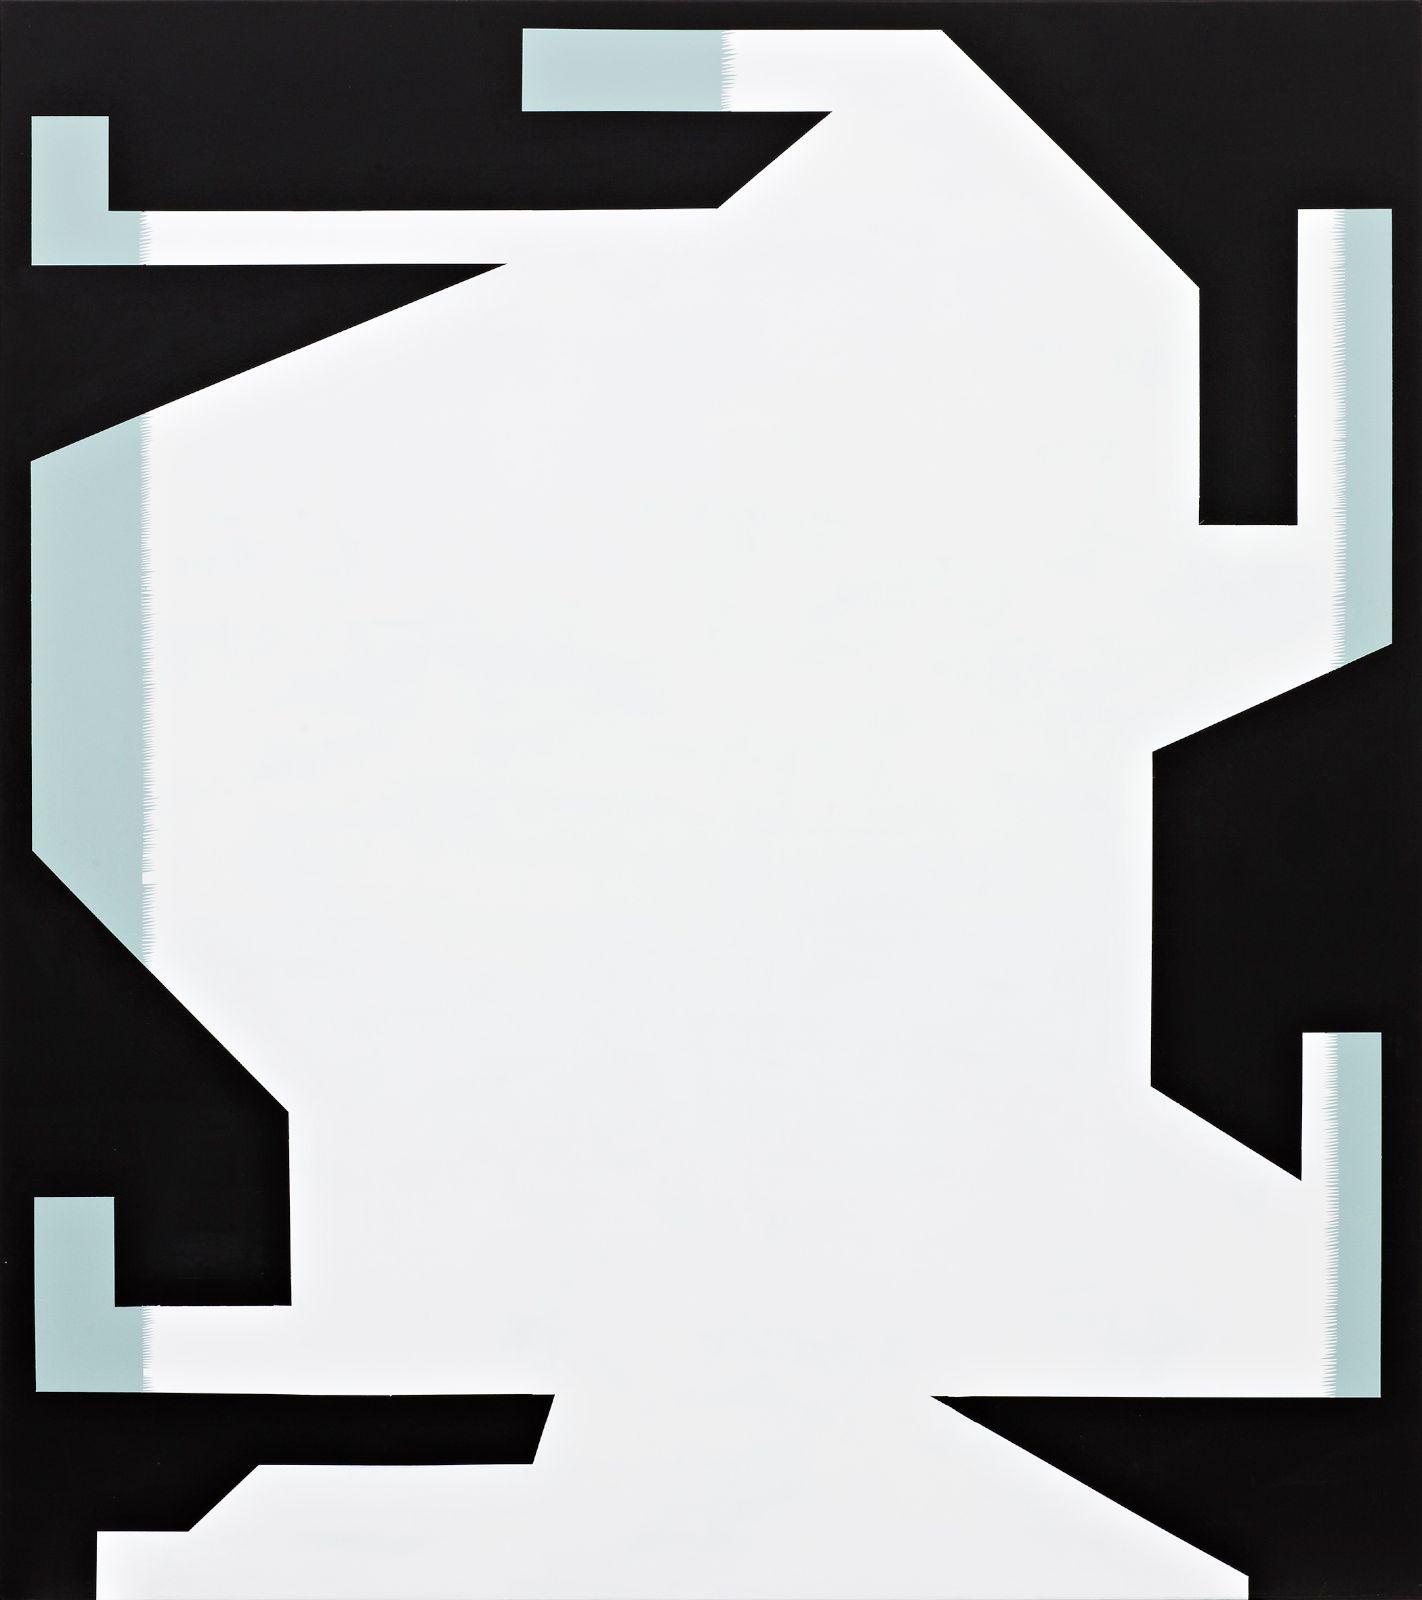 The Bretagne No. 4, 2010, acrylic on canvas, 175 x 155 cm